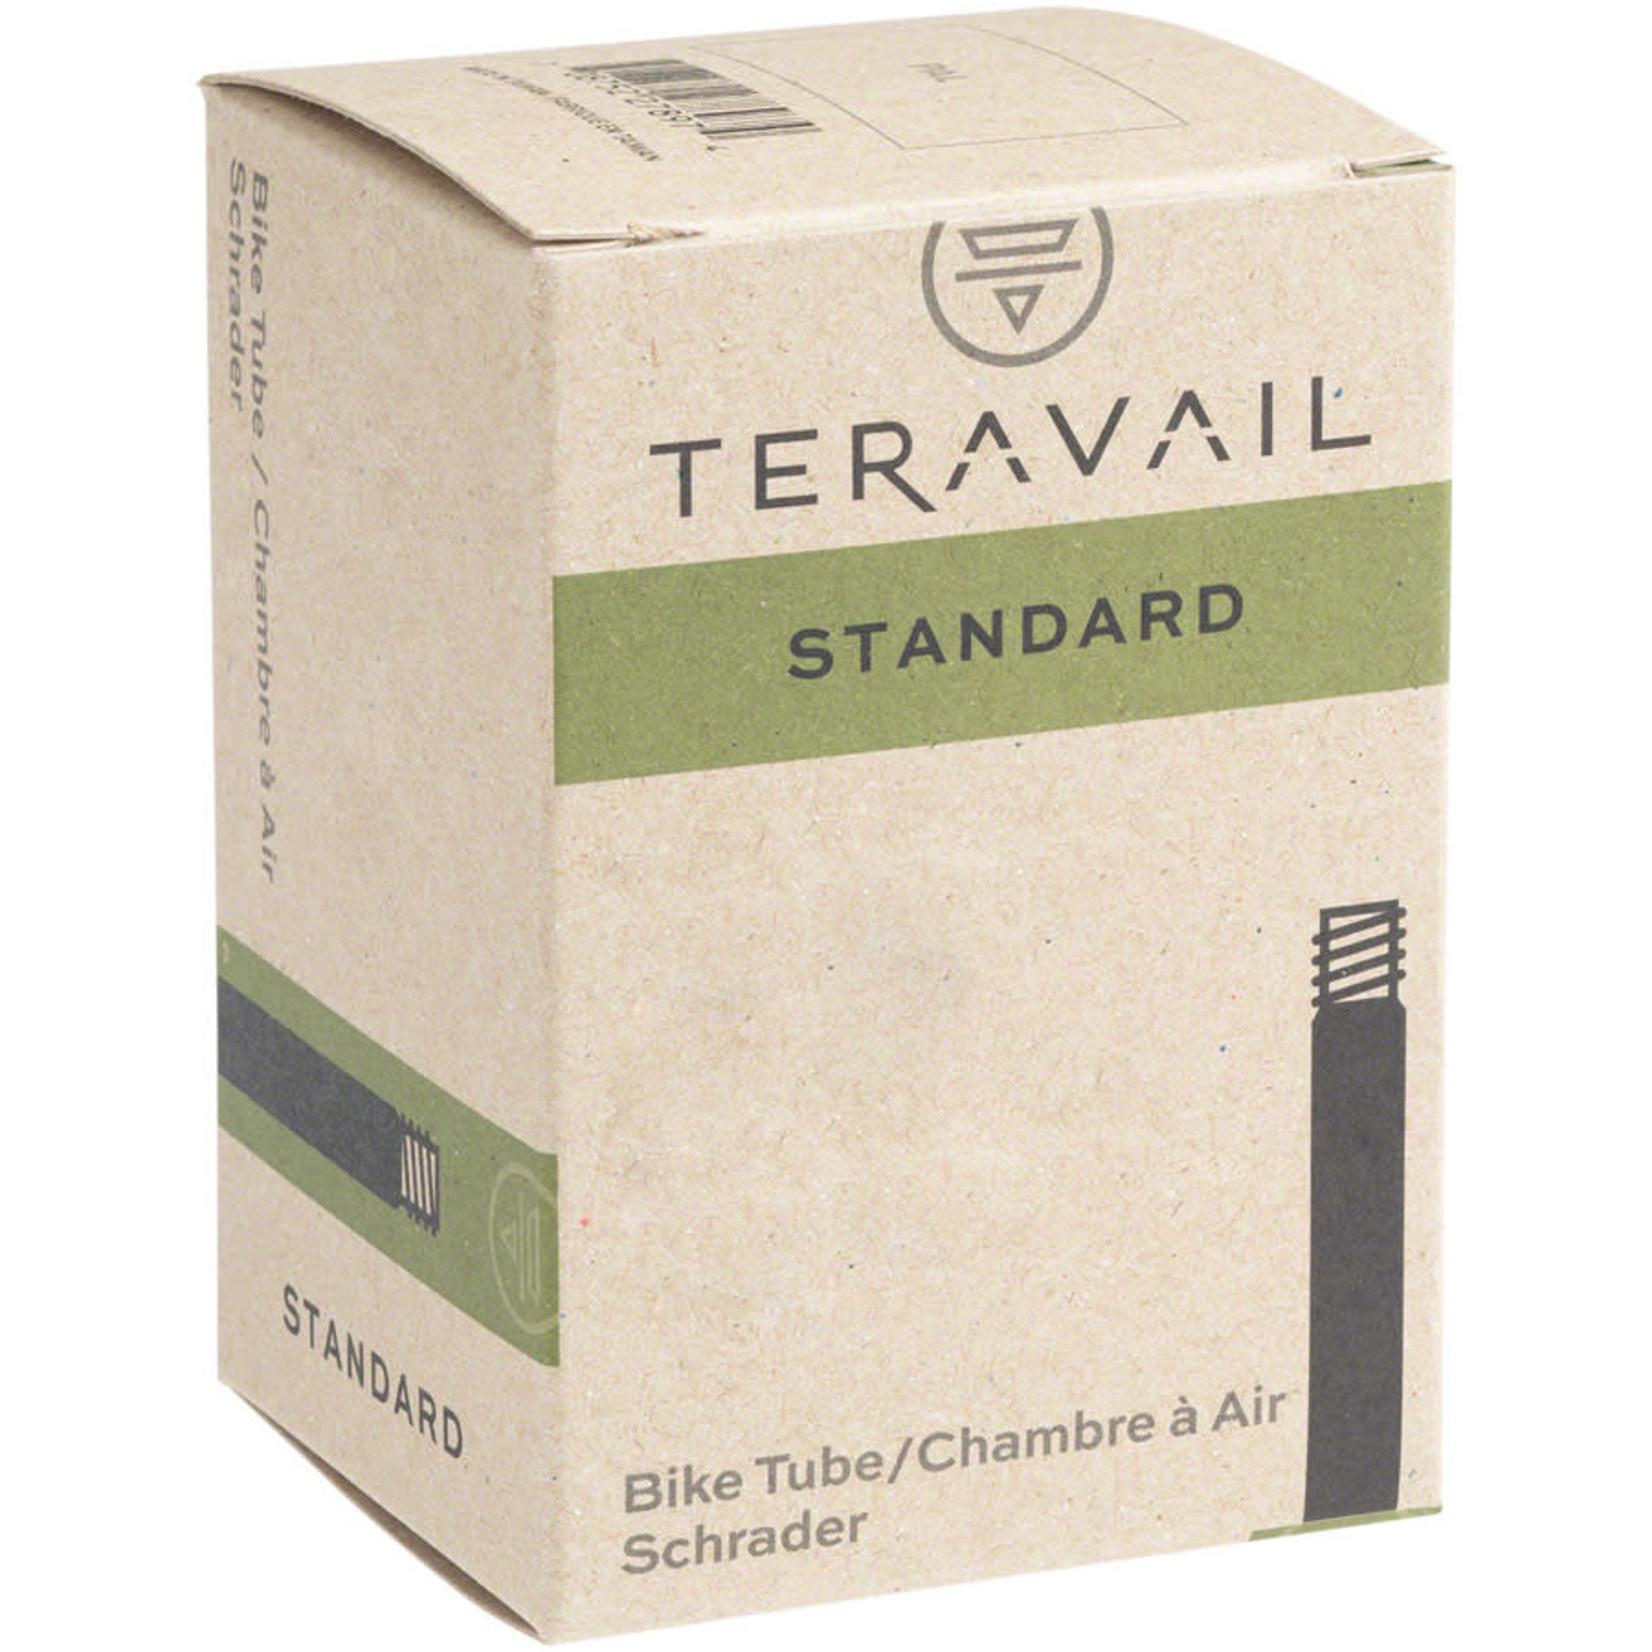 "Q-Tubes Q-Tubes / Teravail 16"" x 1.25-1.5"" Schrader Valve Tube 76g *Low Lead Valve*"